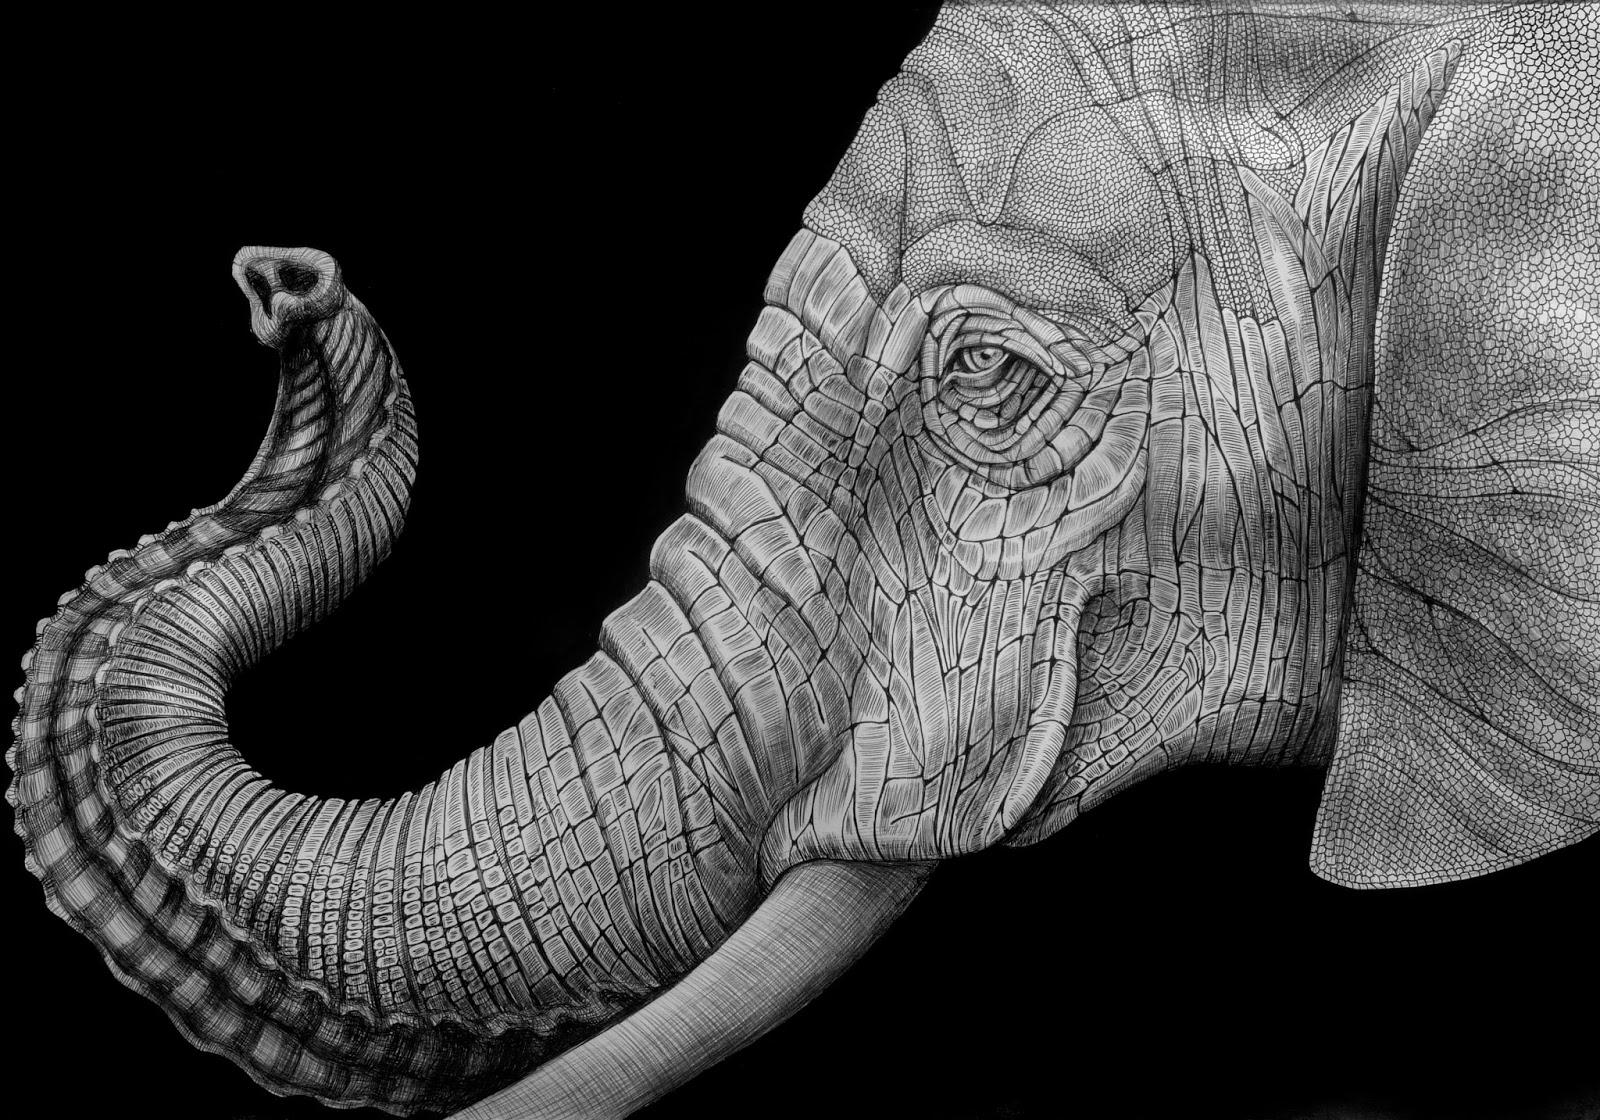 elephant face drawing - photo #23